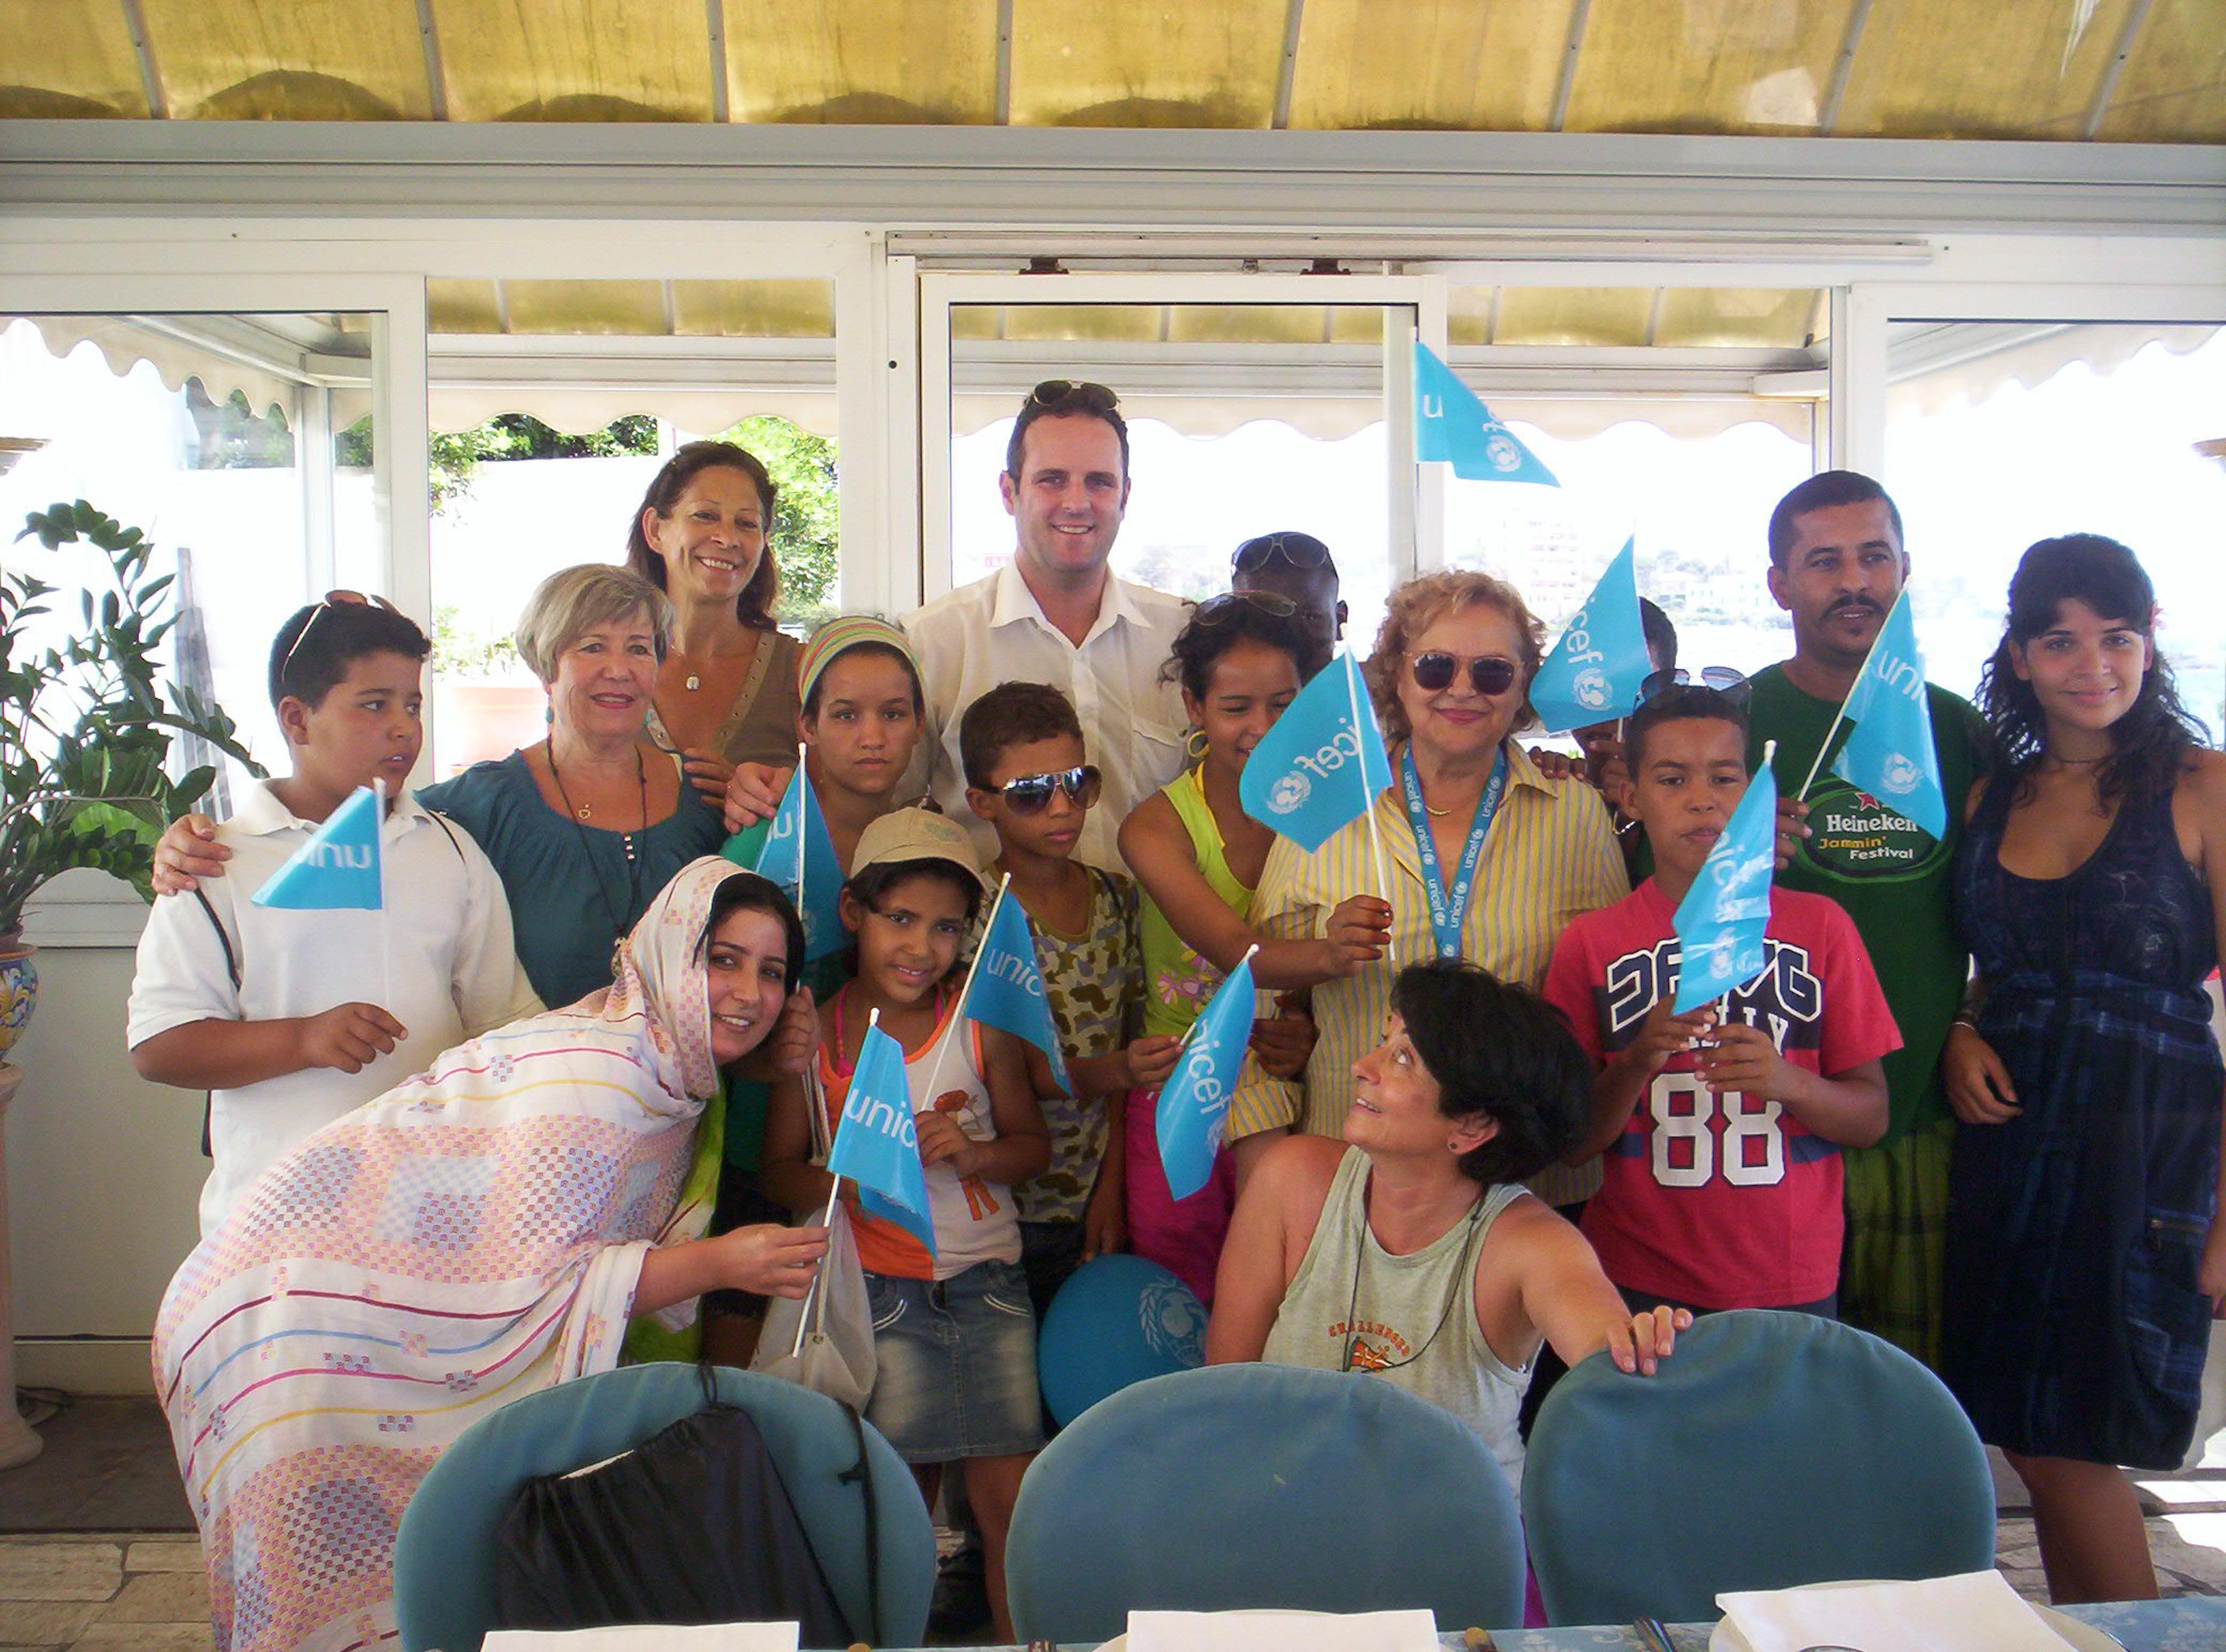 Tolfa e Civitavecchia per i piccoli bambini Saharawi